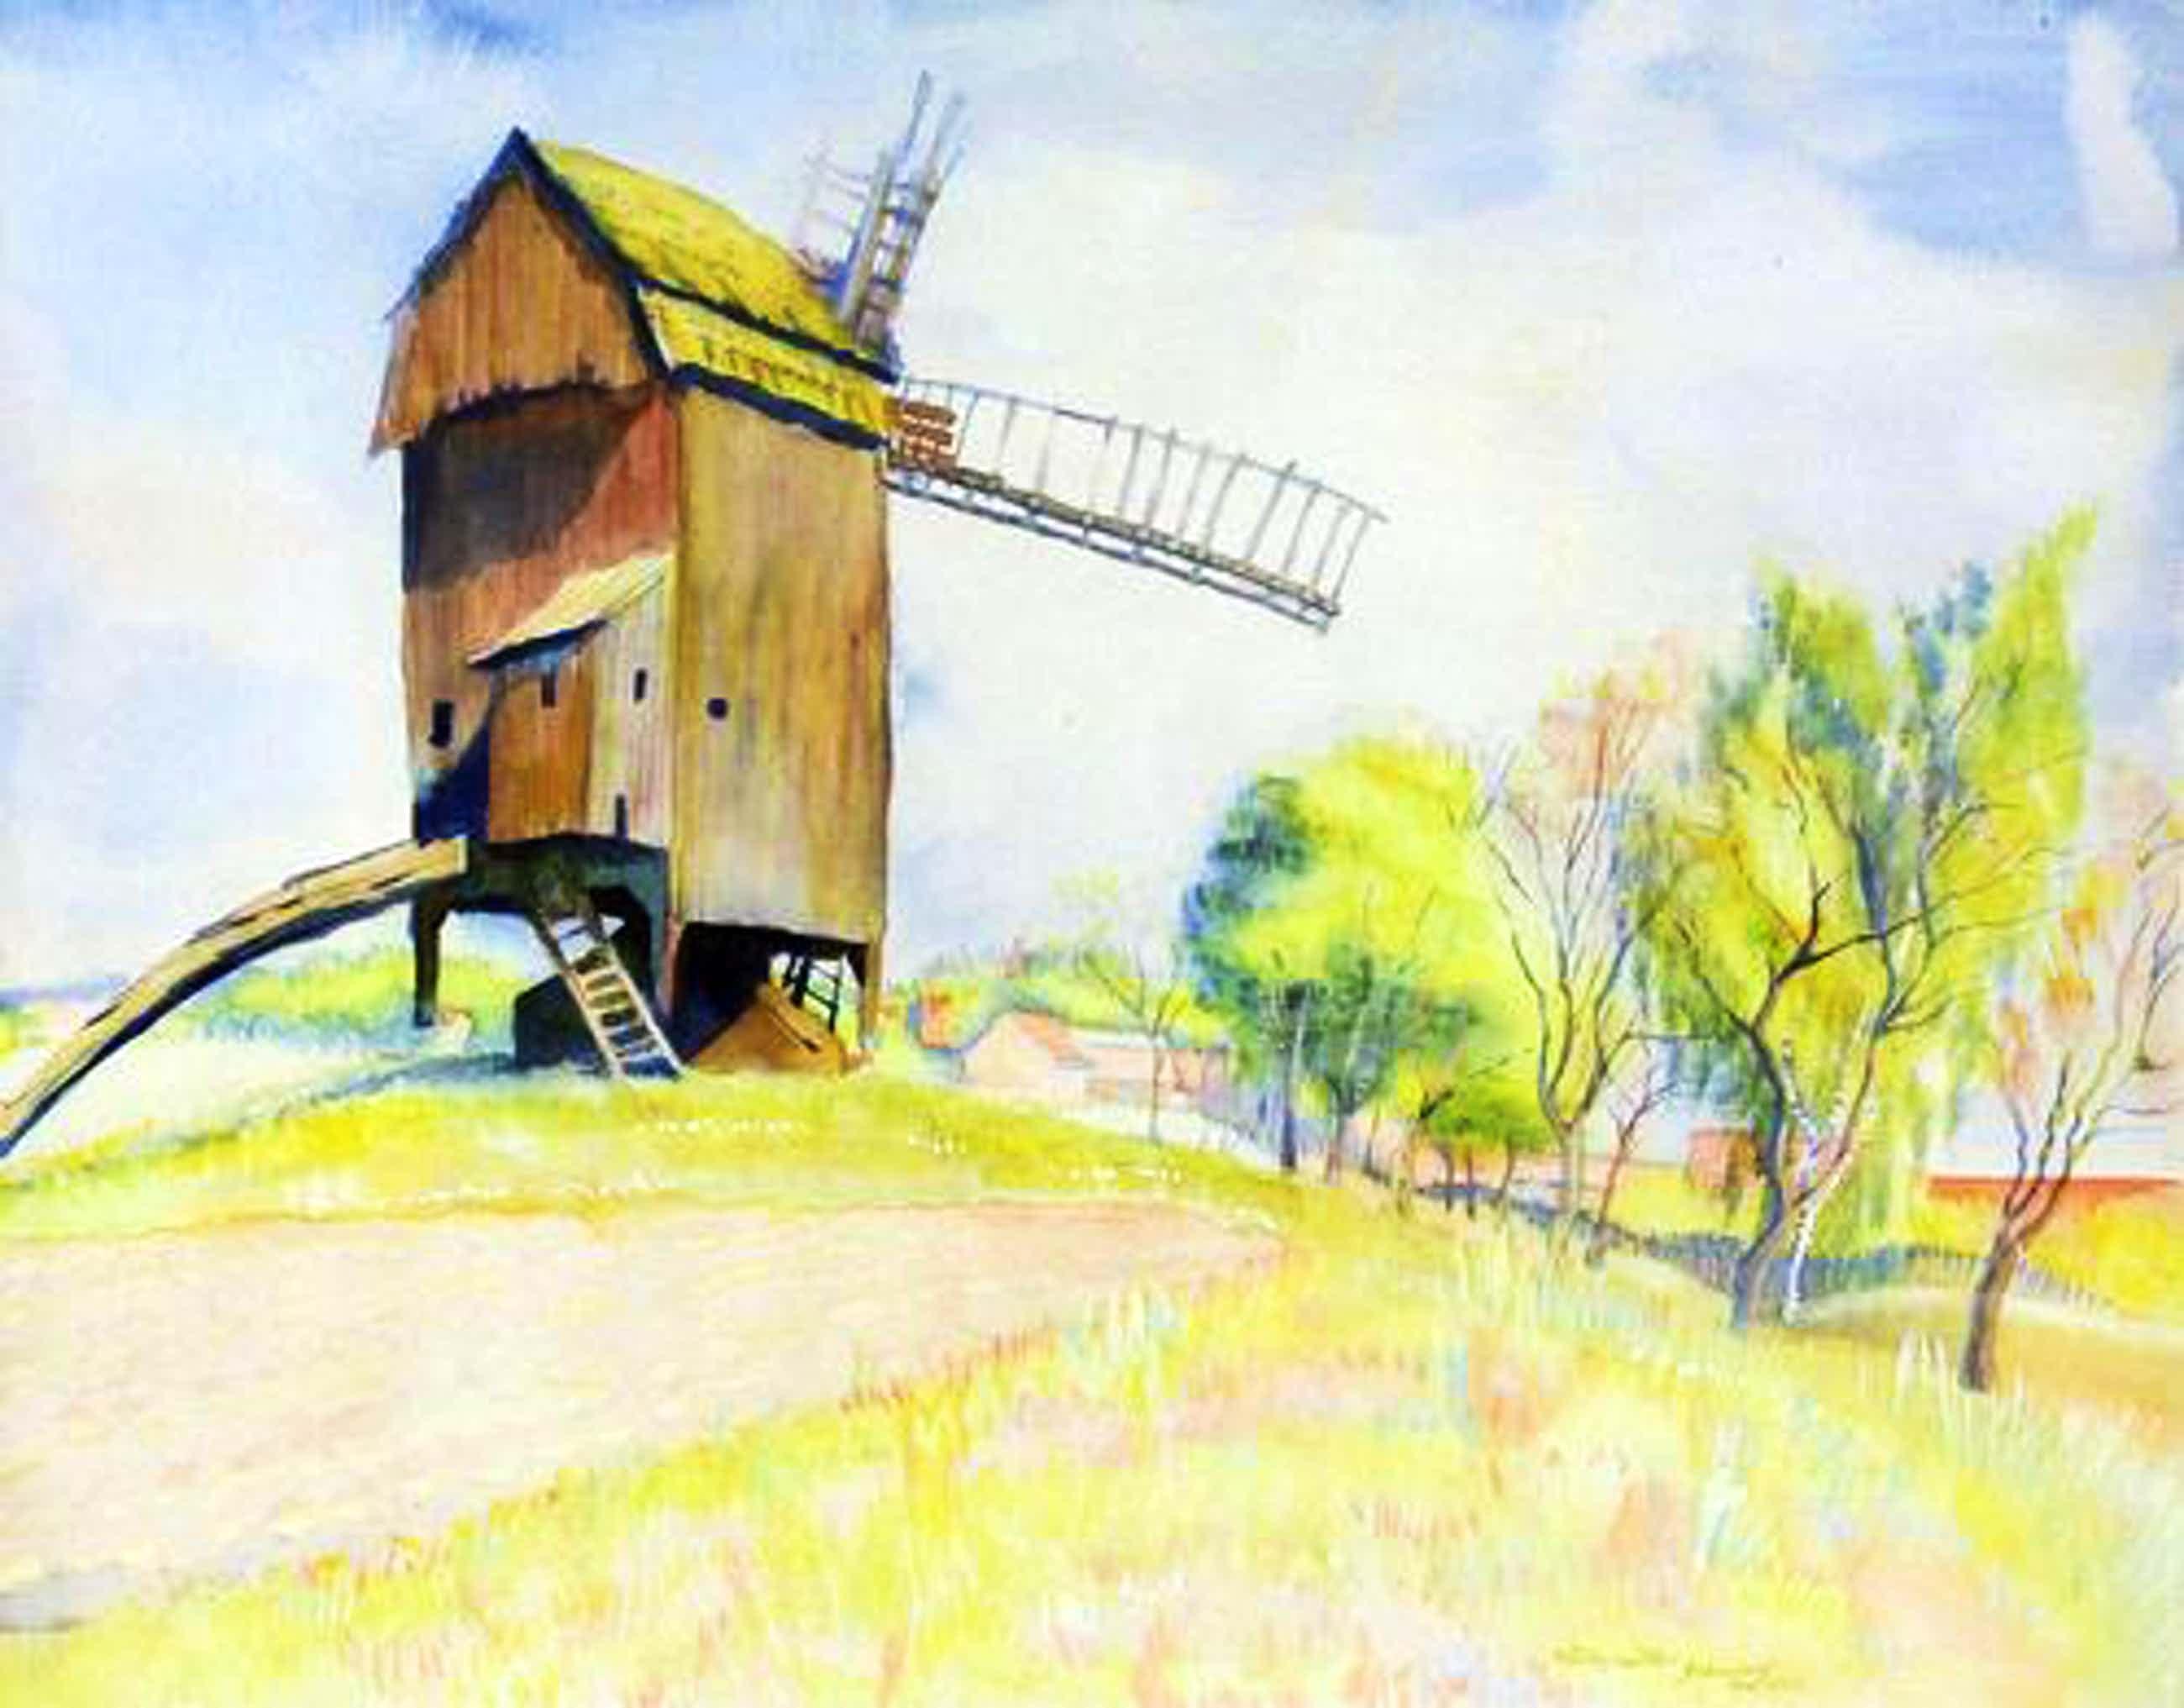 Conrad Felixmüller - Windmühle bei Gebersdorf/Teltow, 1940, Aquarell auf leichtem Karton kopen? Bied vanaf 5900!